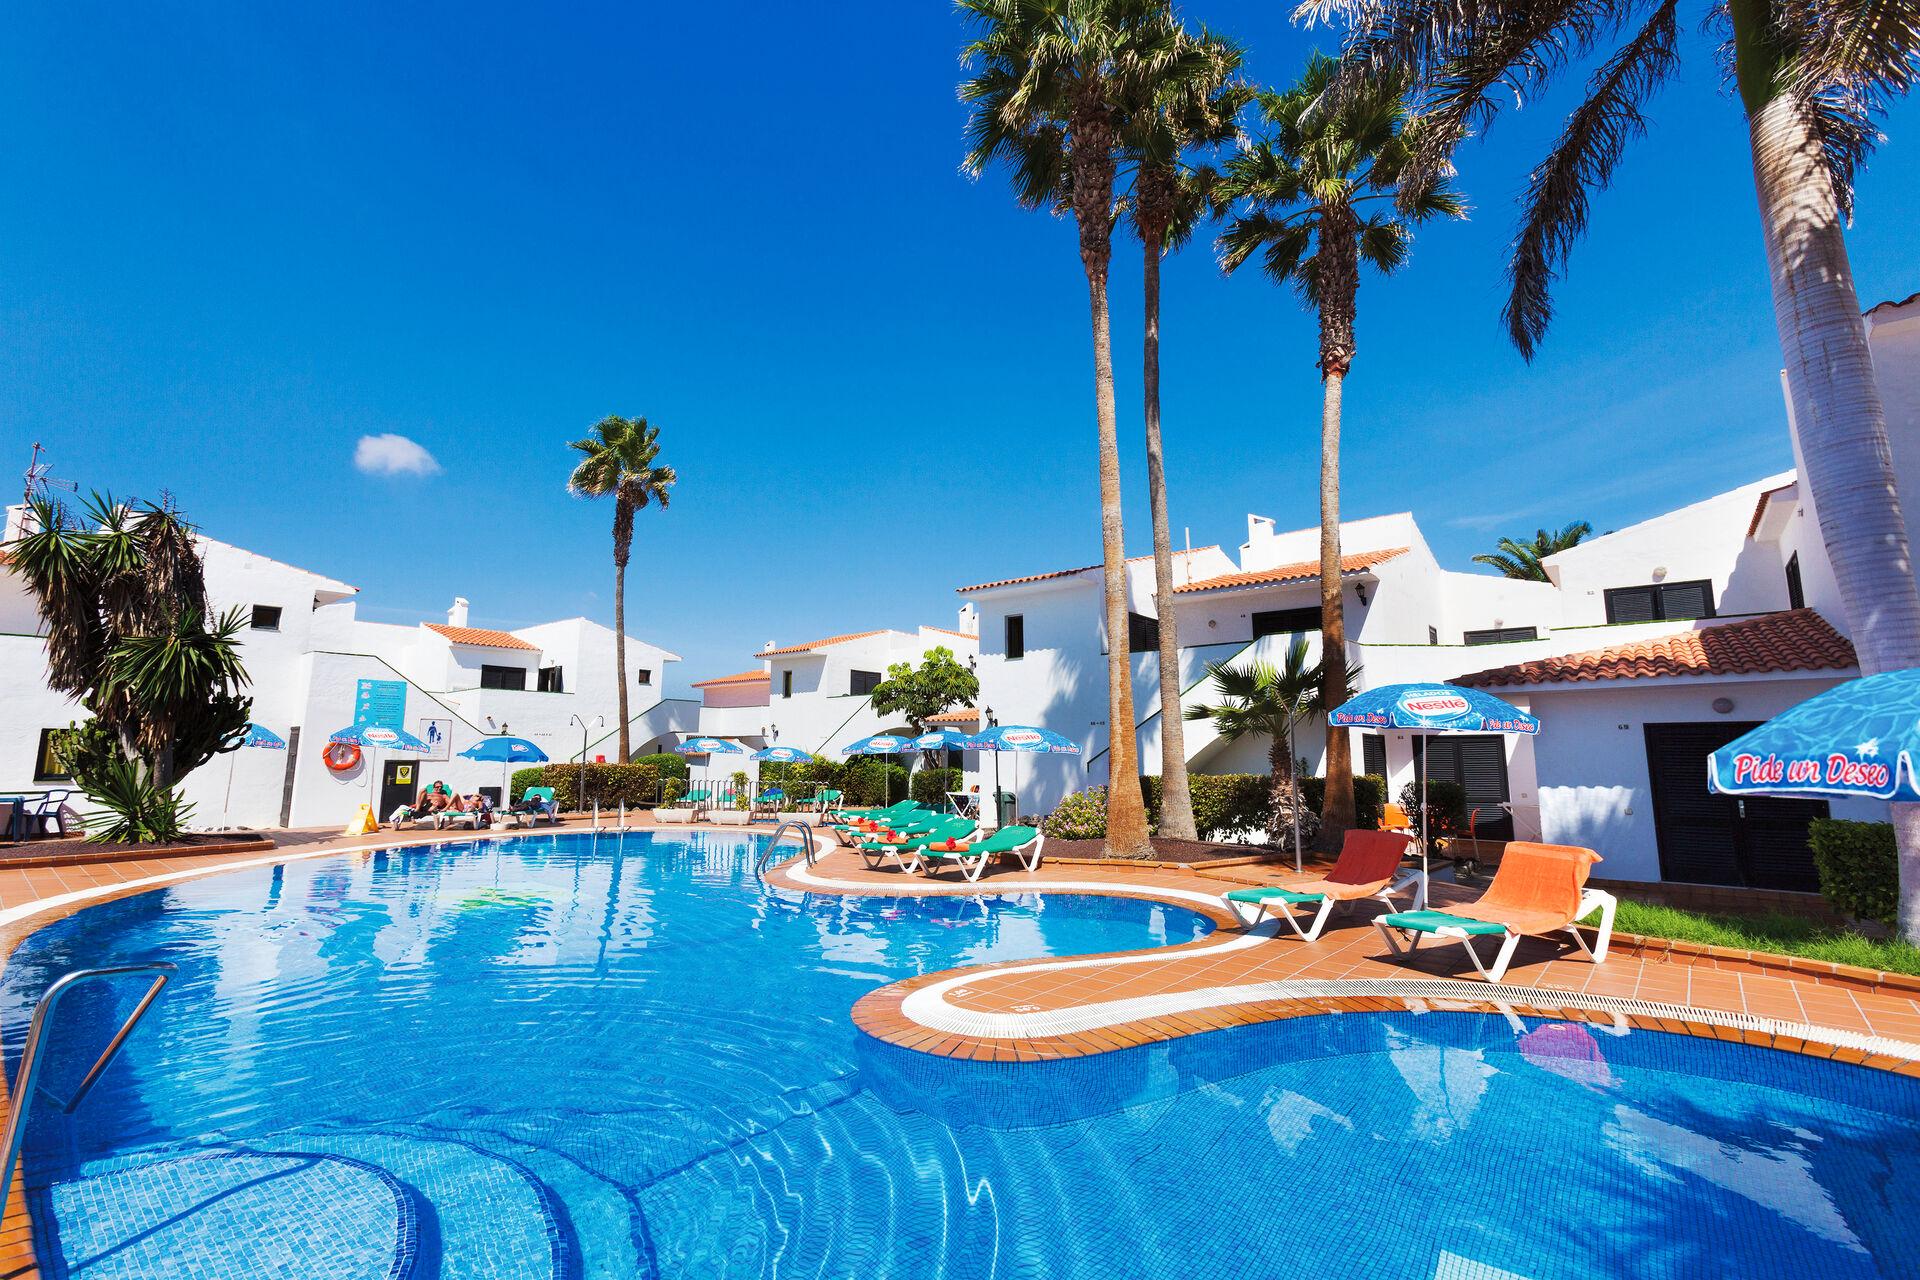 Séjour Canaries - Appartements Puerto Caleta - 2*